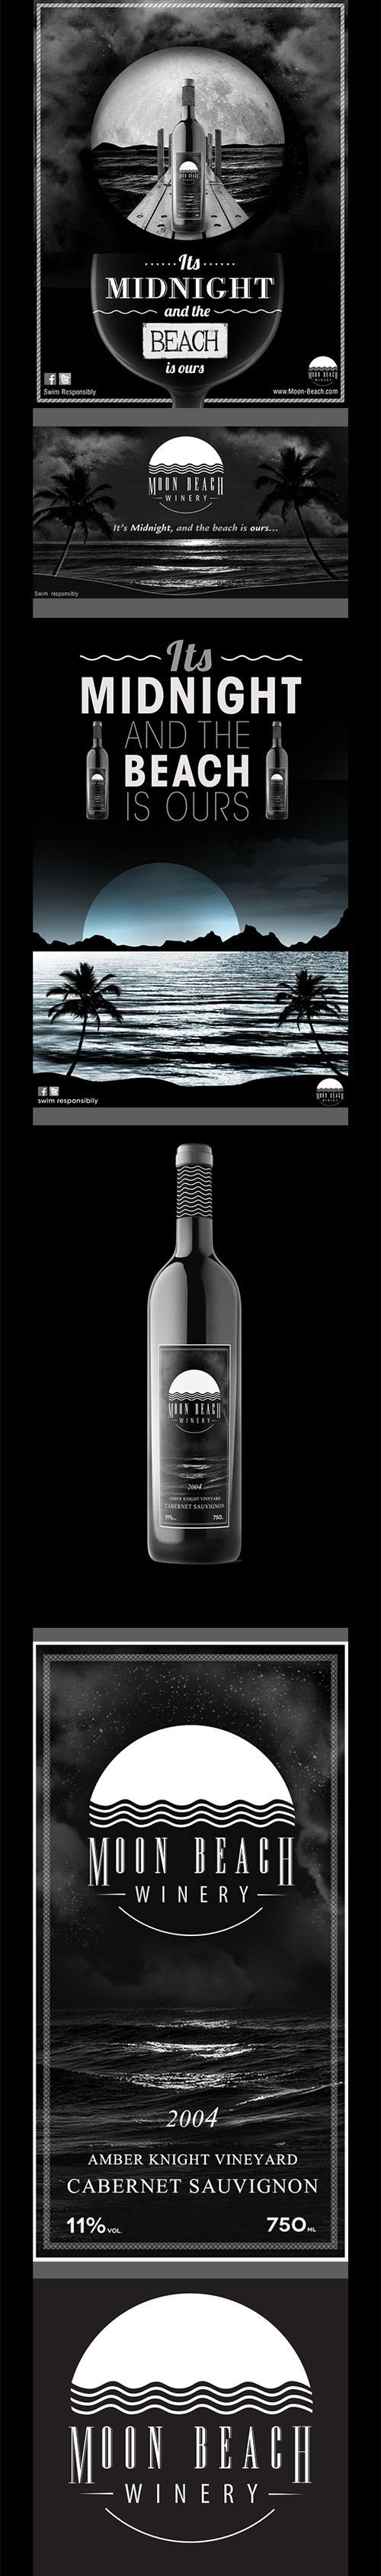 wine ad black and white moon beach